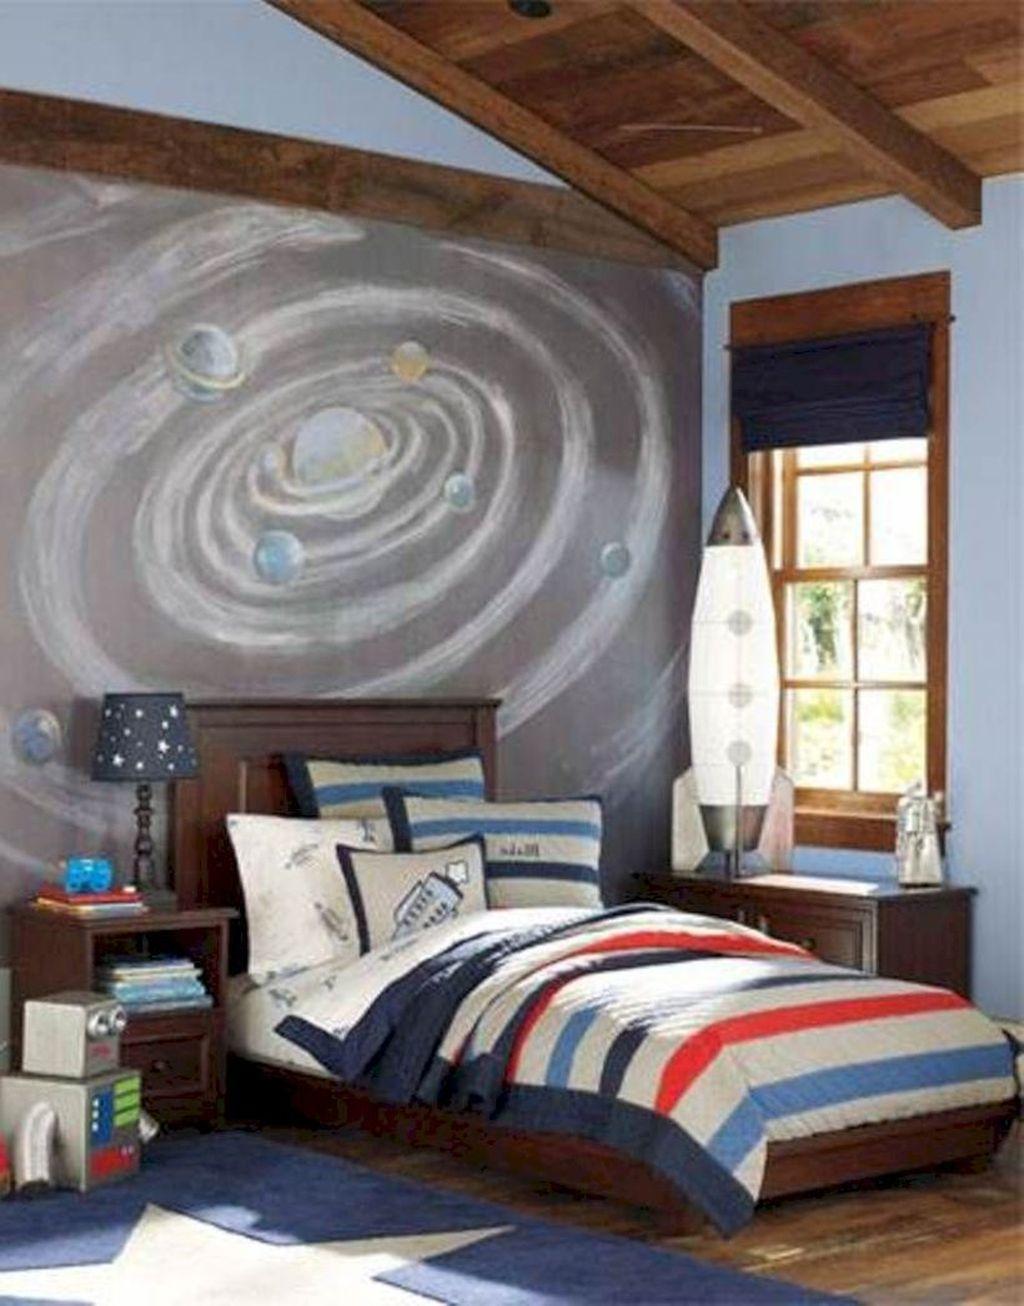 Inspiring Outer Space Bedroom Decor Ideas 34